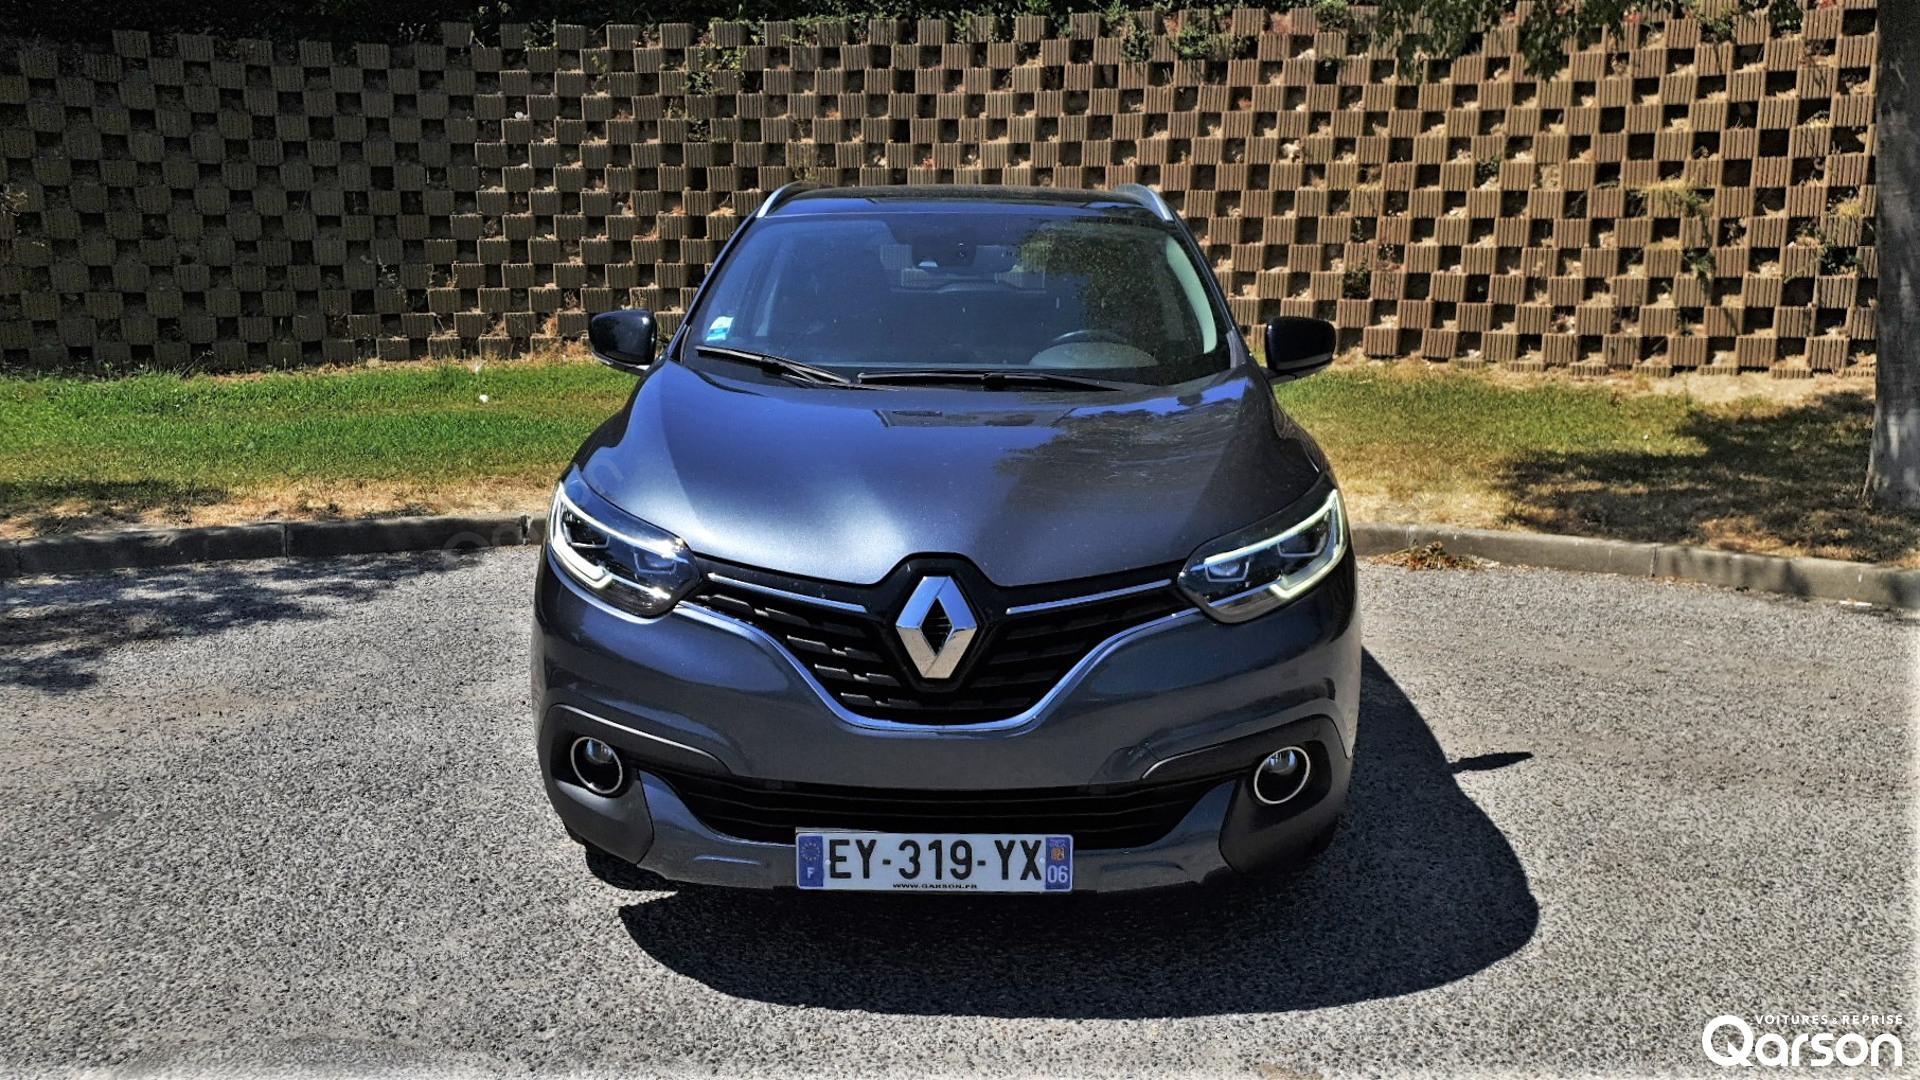 Calandre Renault Kadjar